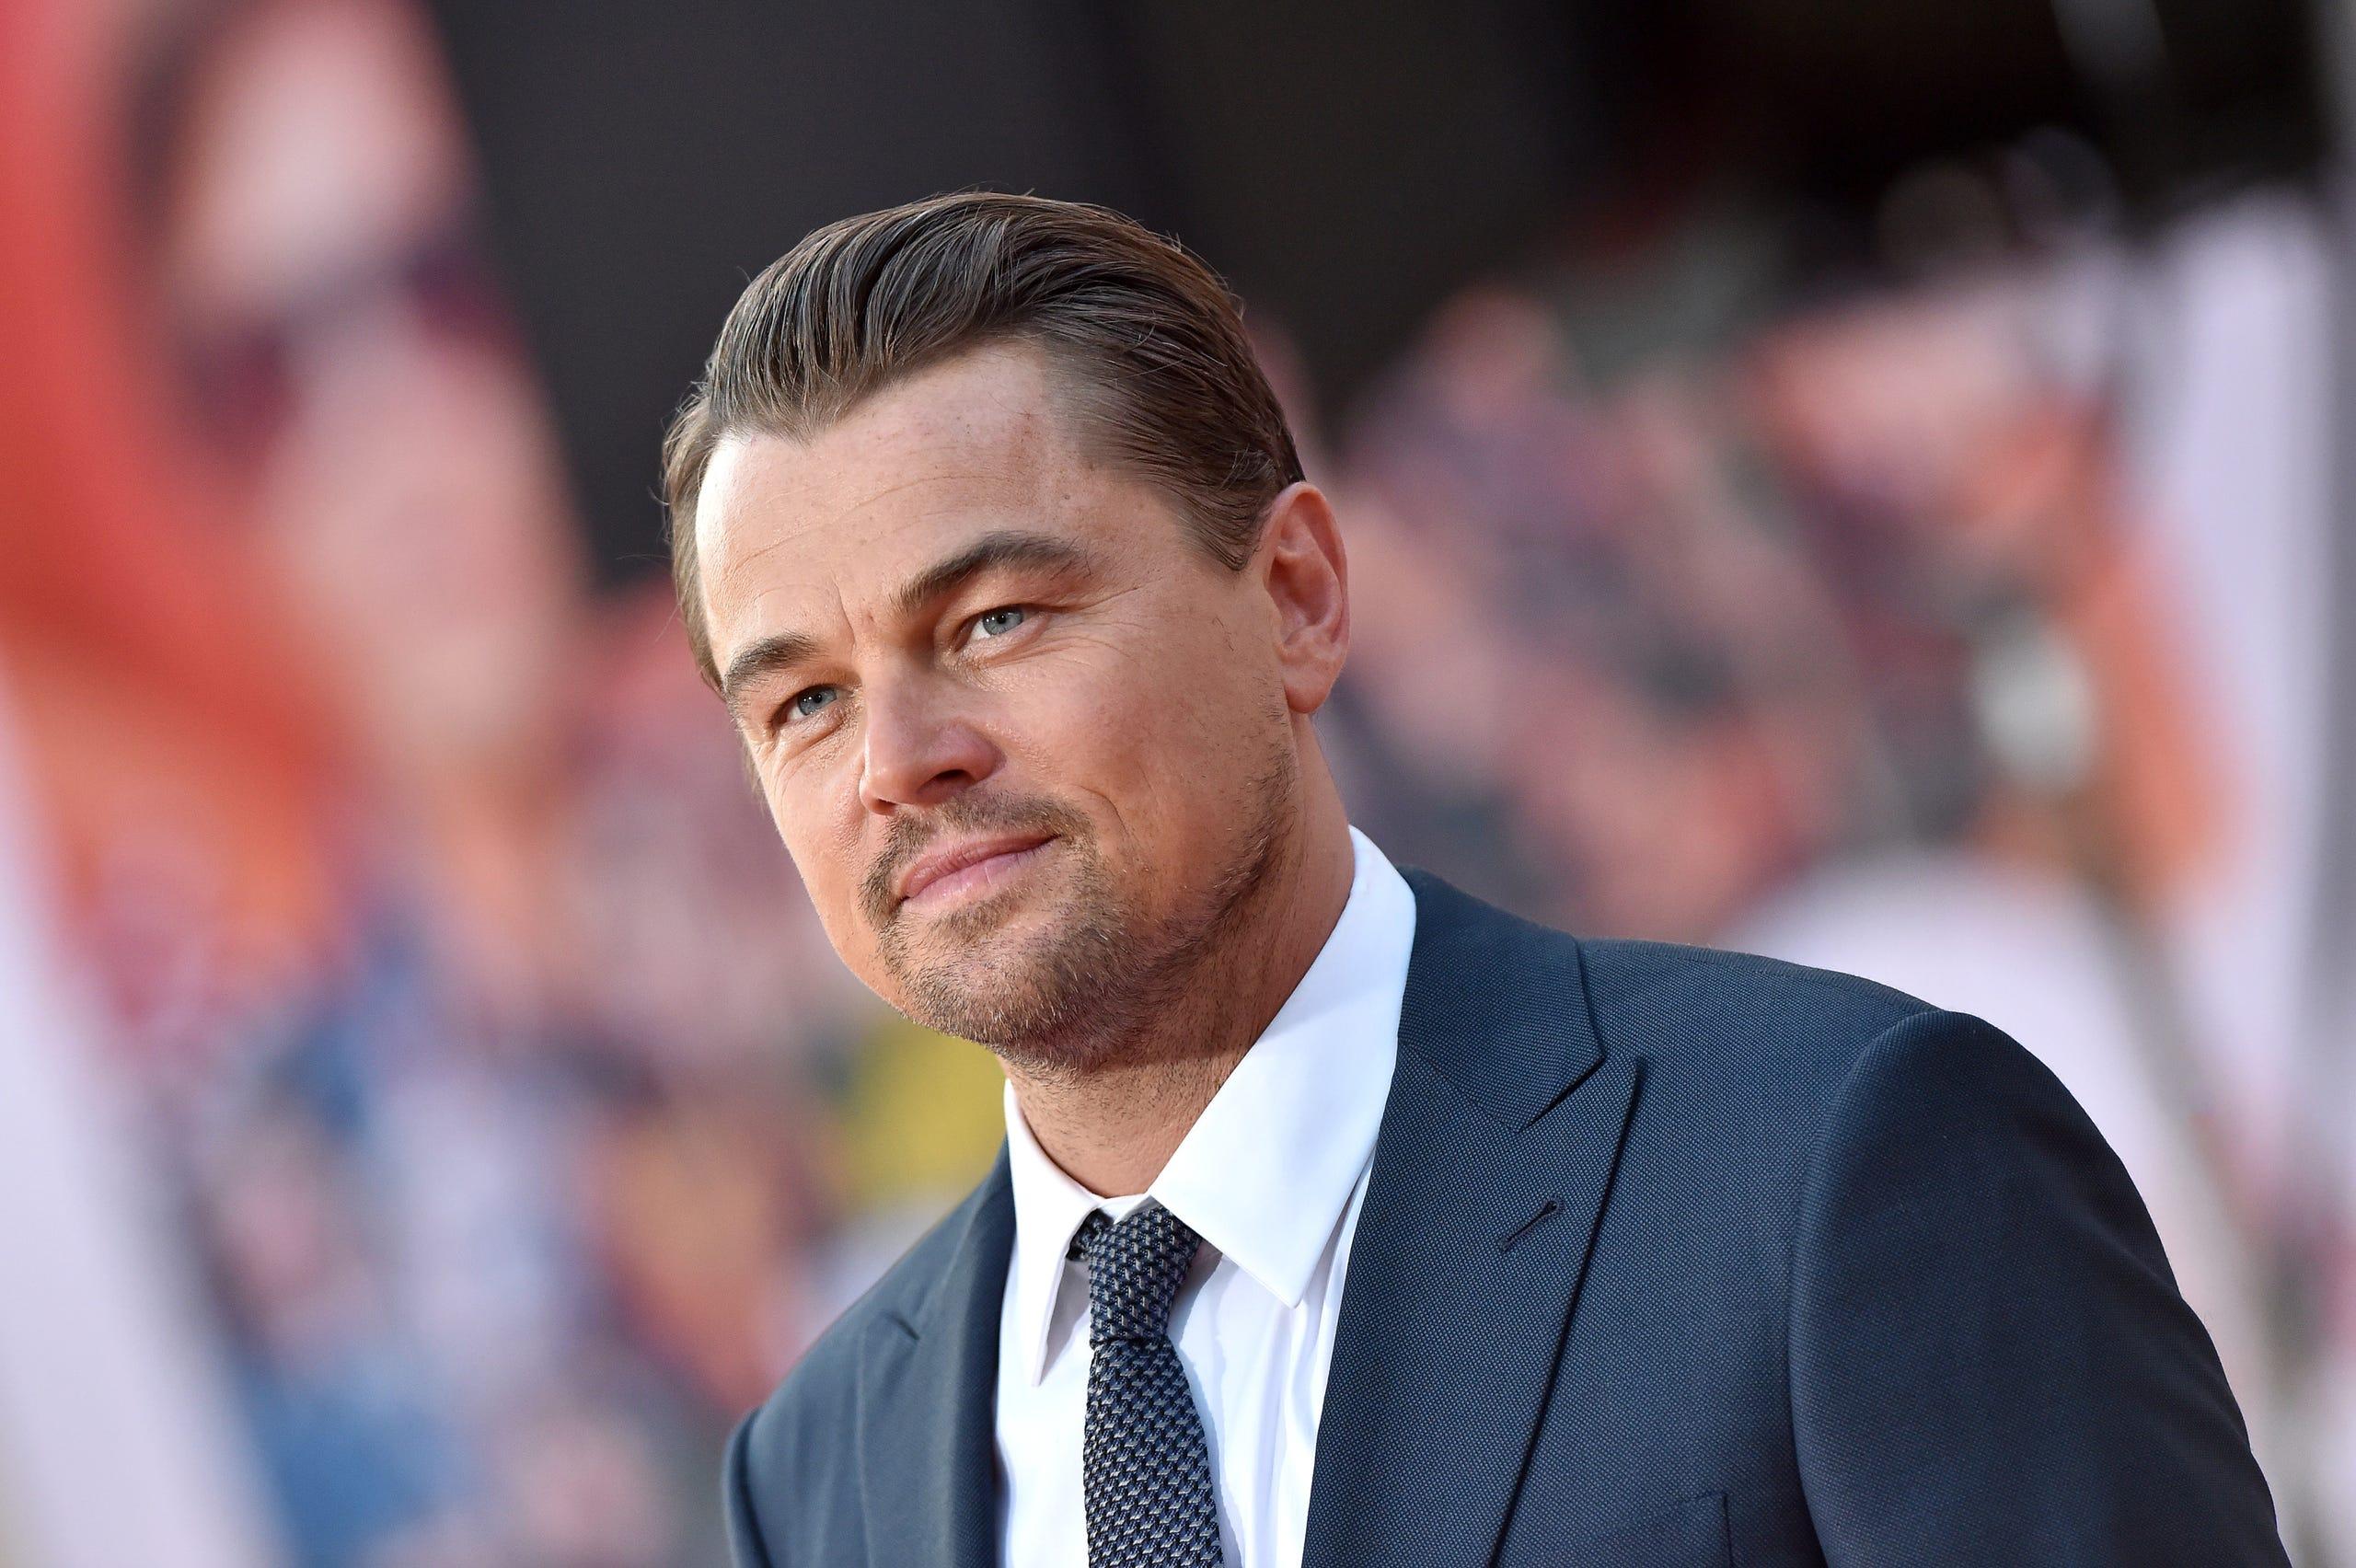 Leonardo DiCaprio: All his best photos through the years